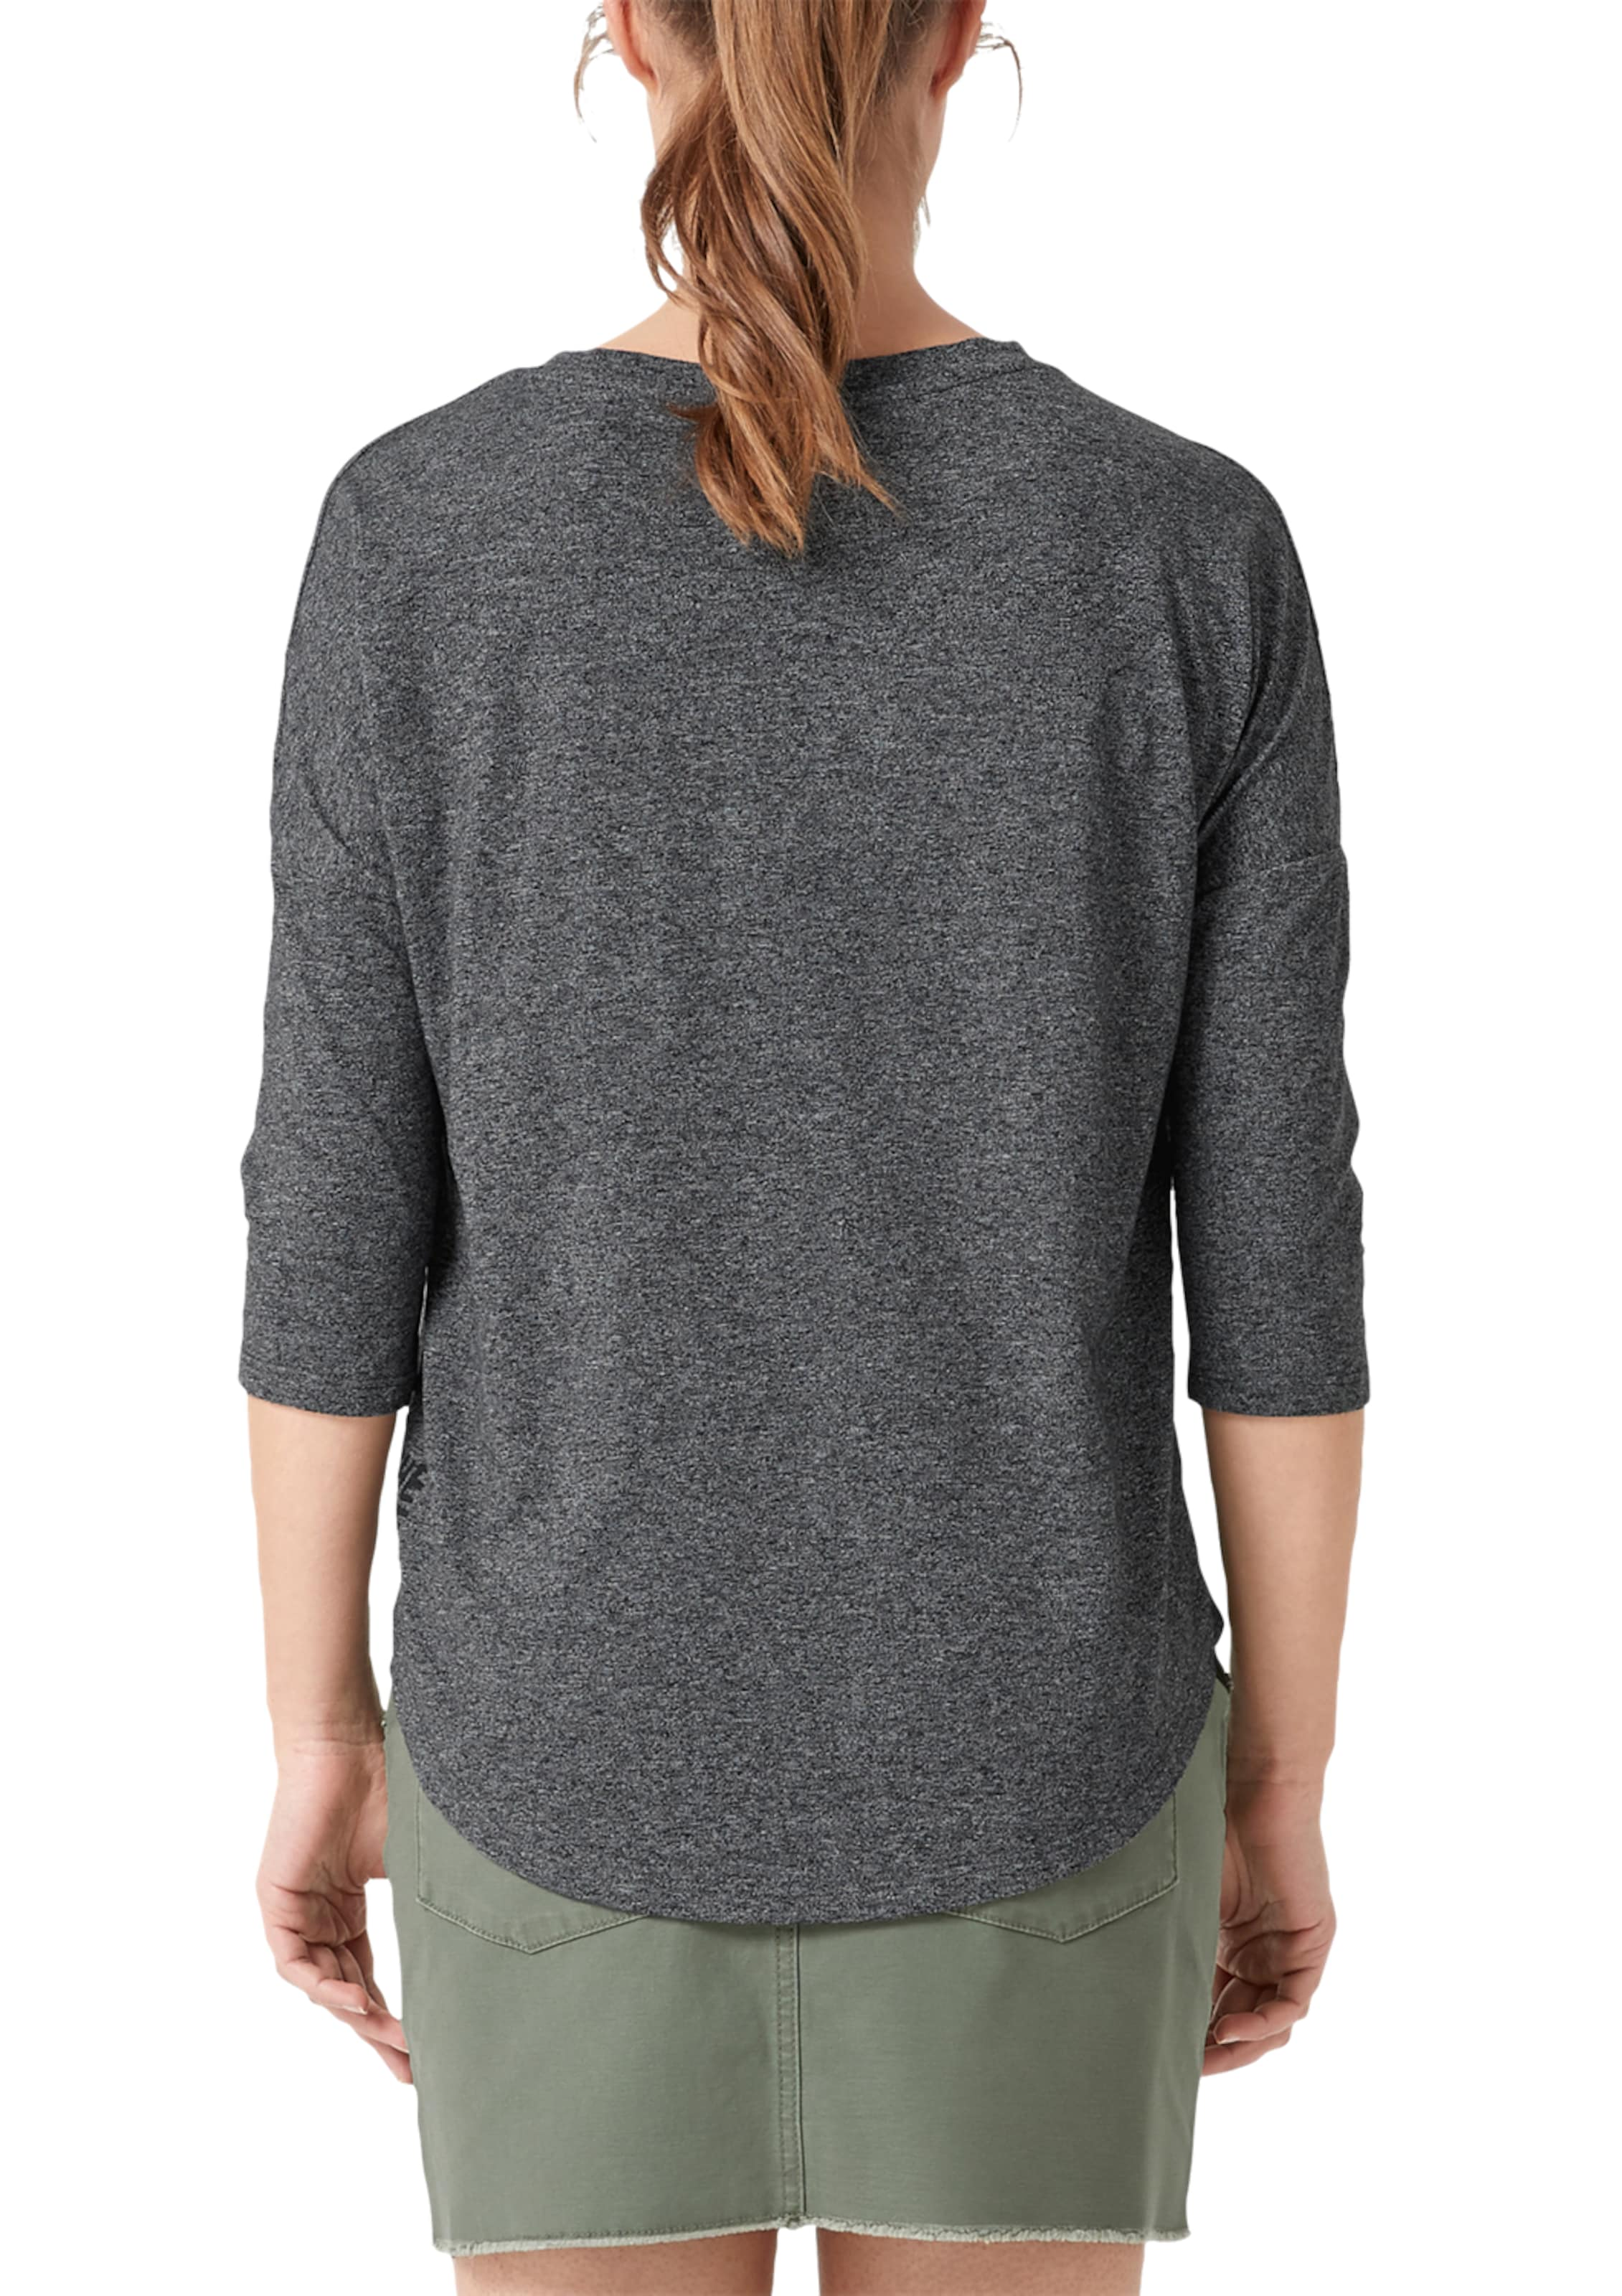 In Graumeliert Designed s Q Shirt By jLSUGqzMVp